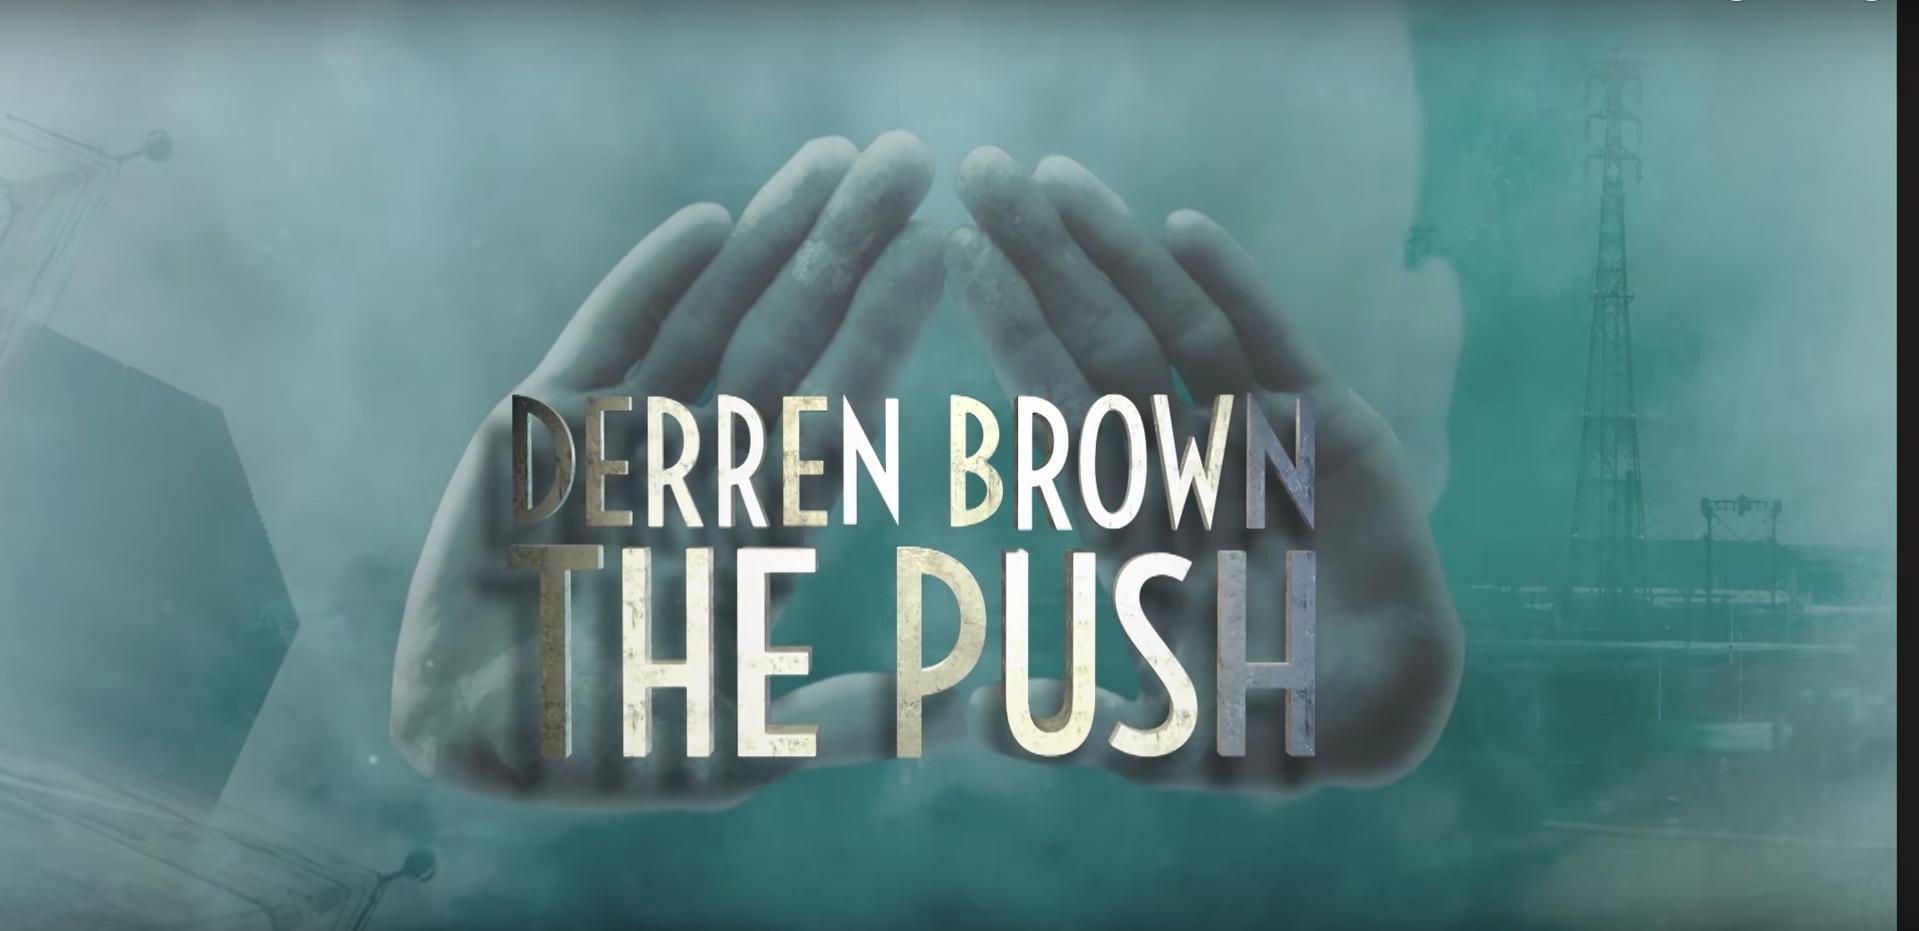 the-push-netflix-fake-real-derren-brown